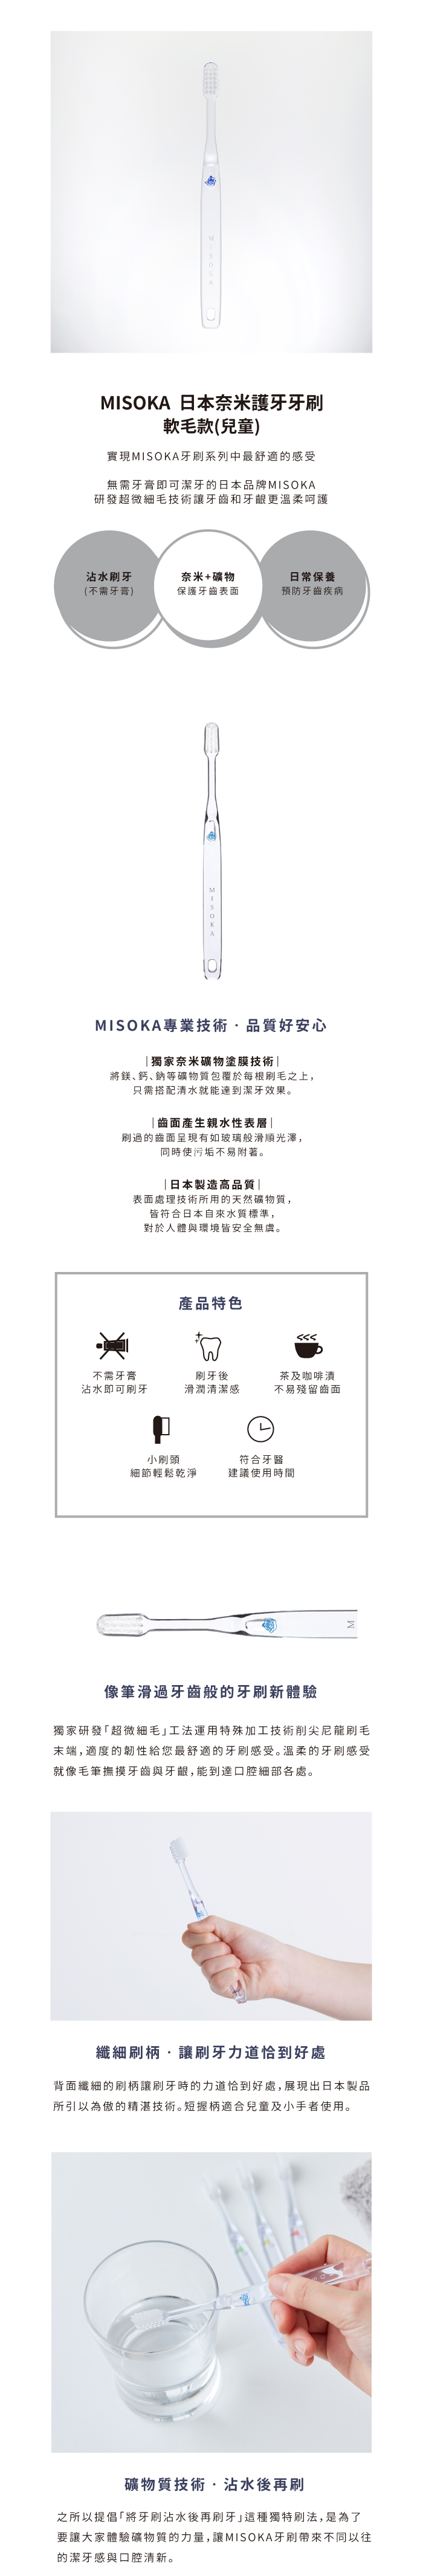 MISOKA │  COMFORT 軟毛款頂級免沾牙膏牙刷 (日本製 / 山吹色 / 兒童)